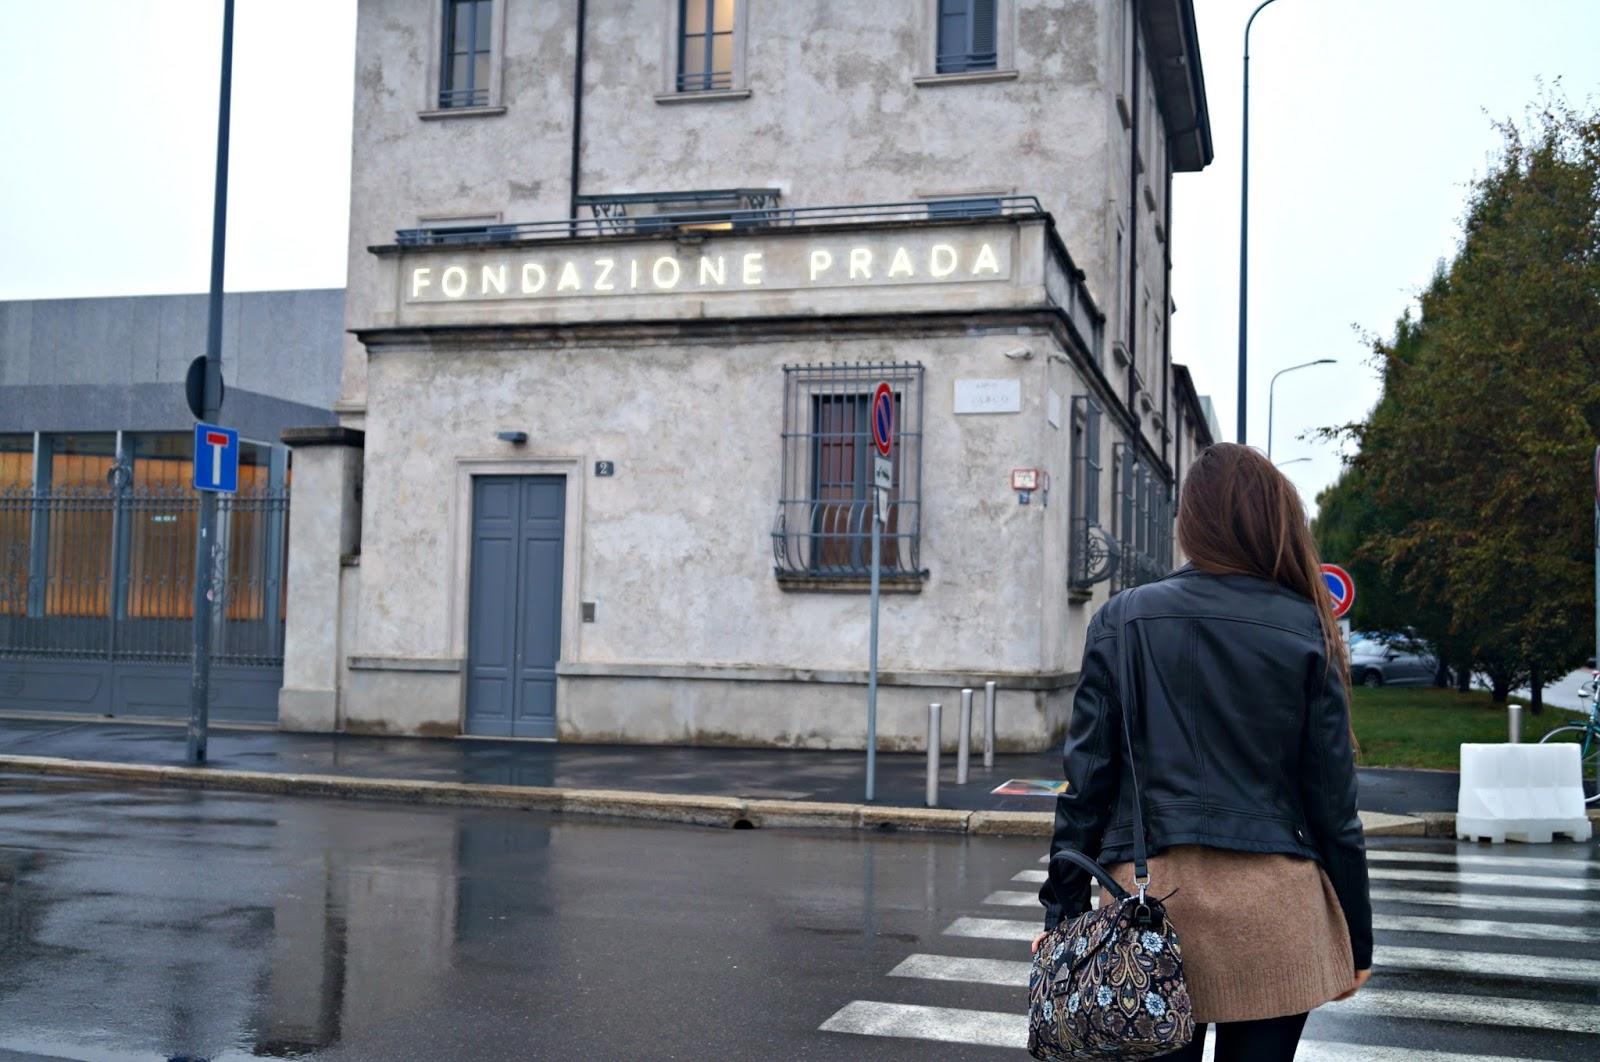 Modowa Mapa Mediolanu/Milan Fashion Map: Fondazione Prada